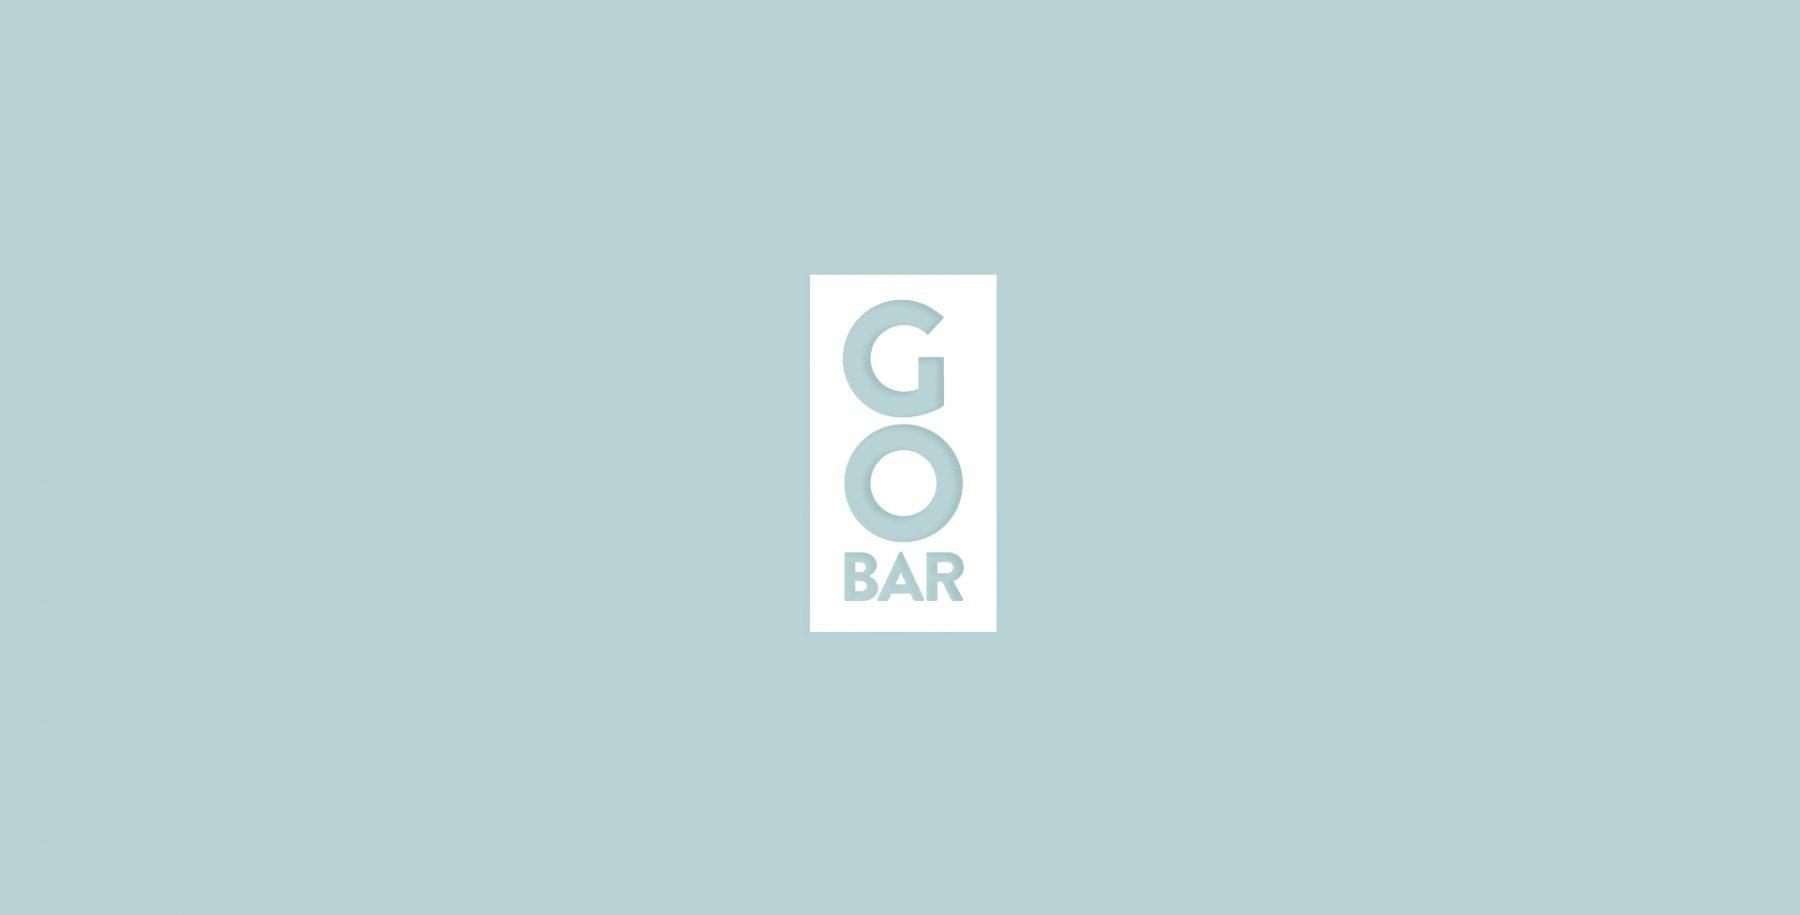 Go Bar baton proteic logo design BroHouse